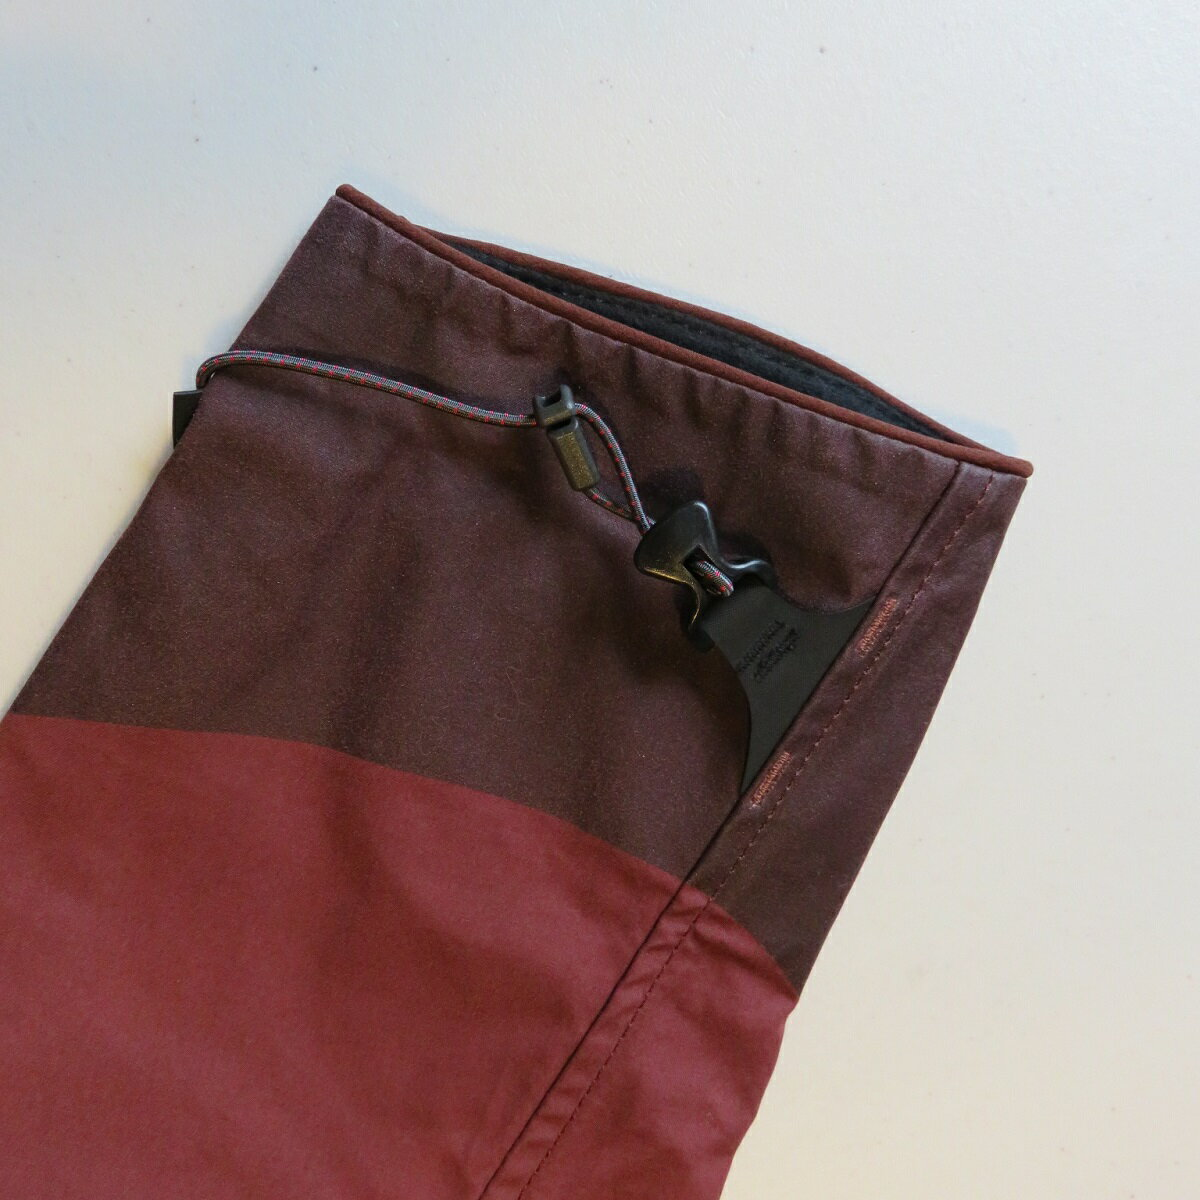 KLATTERMUSEN(クレッタルムーセン) Einride Jacketエイナリーダ ジャケット M's Burnt Lava Mサイズ